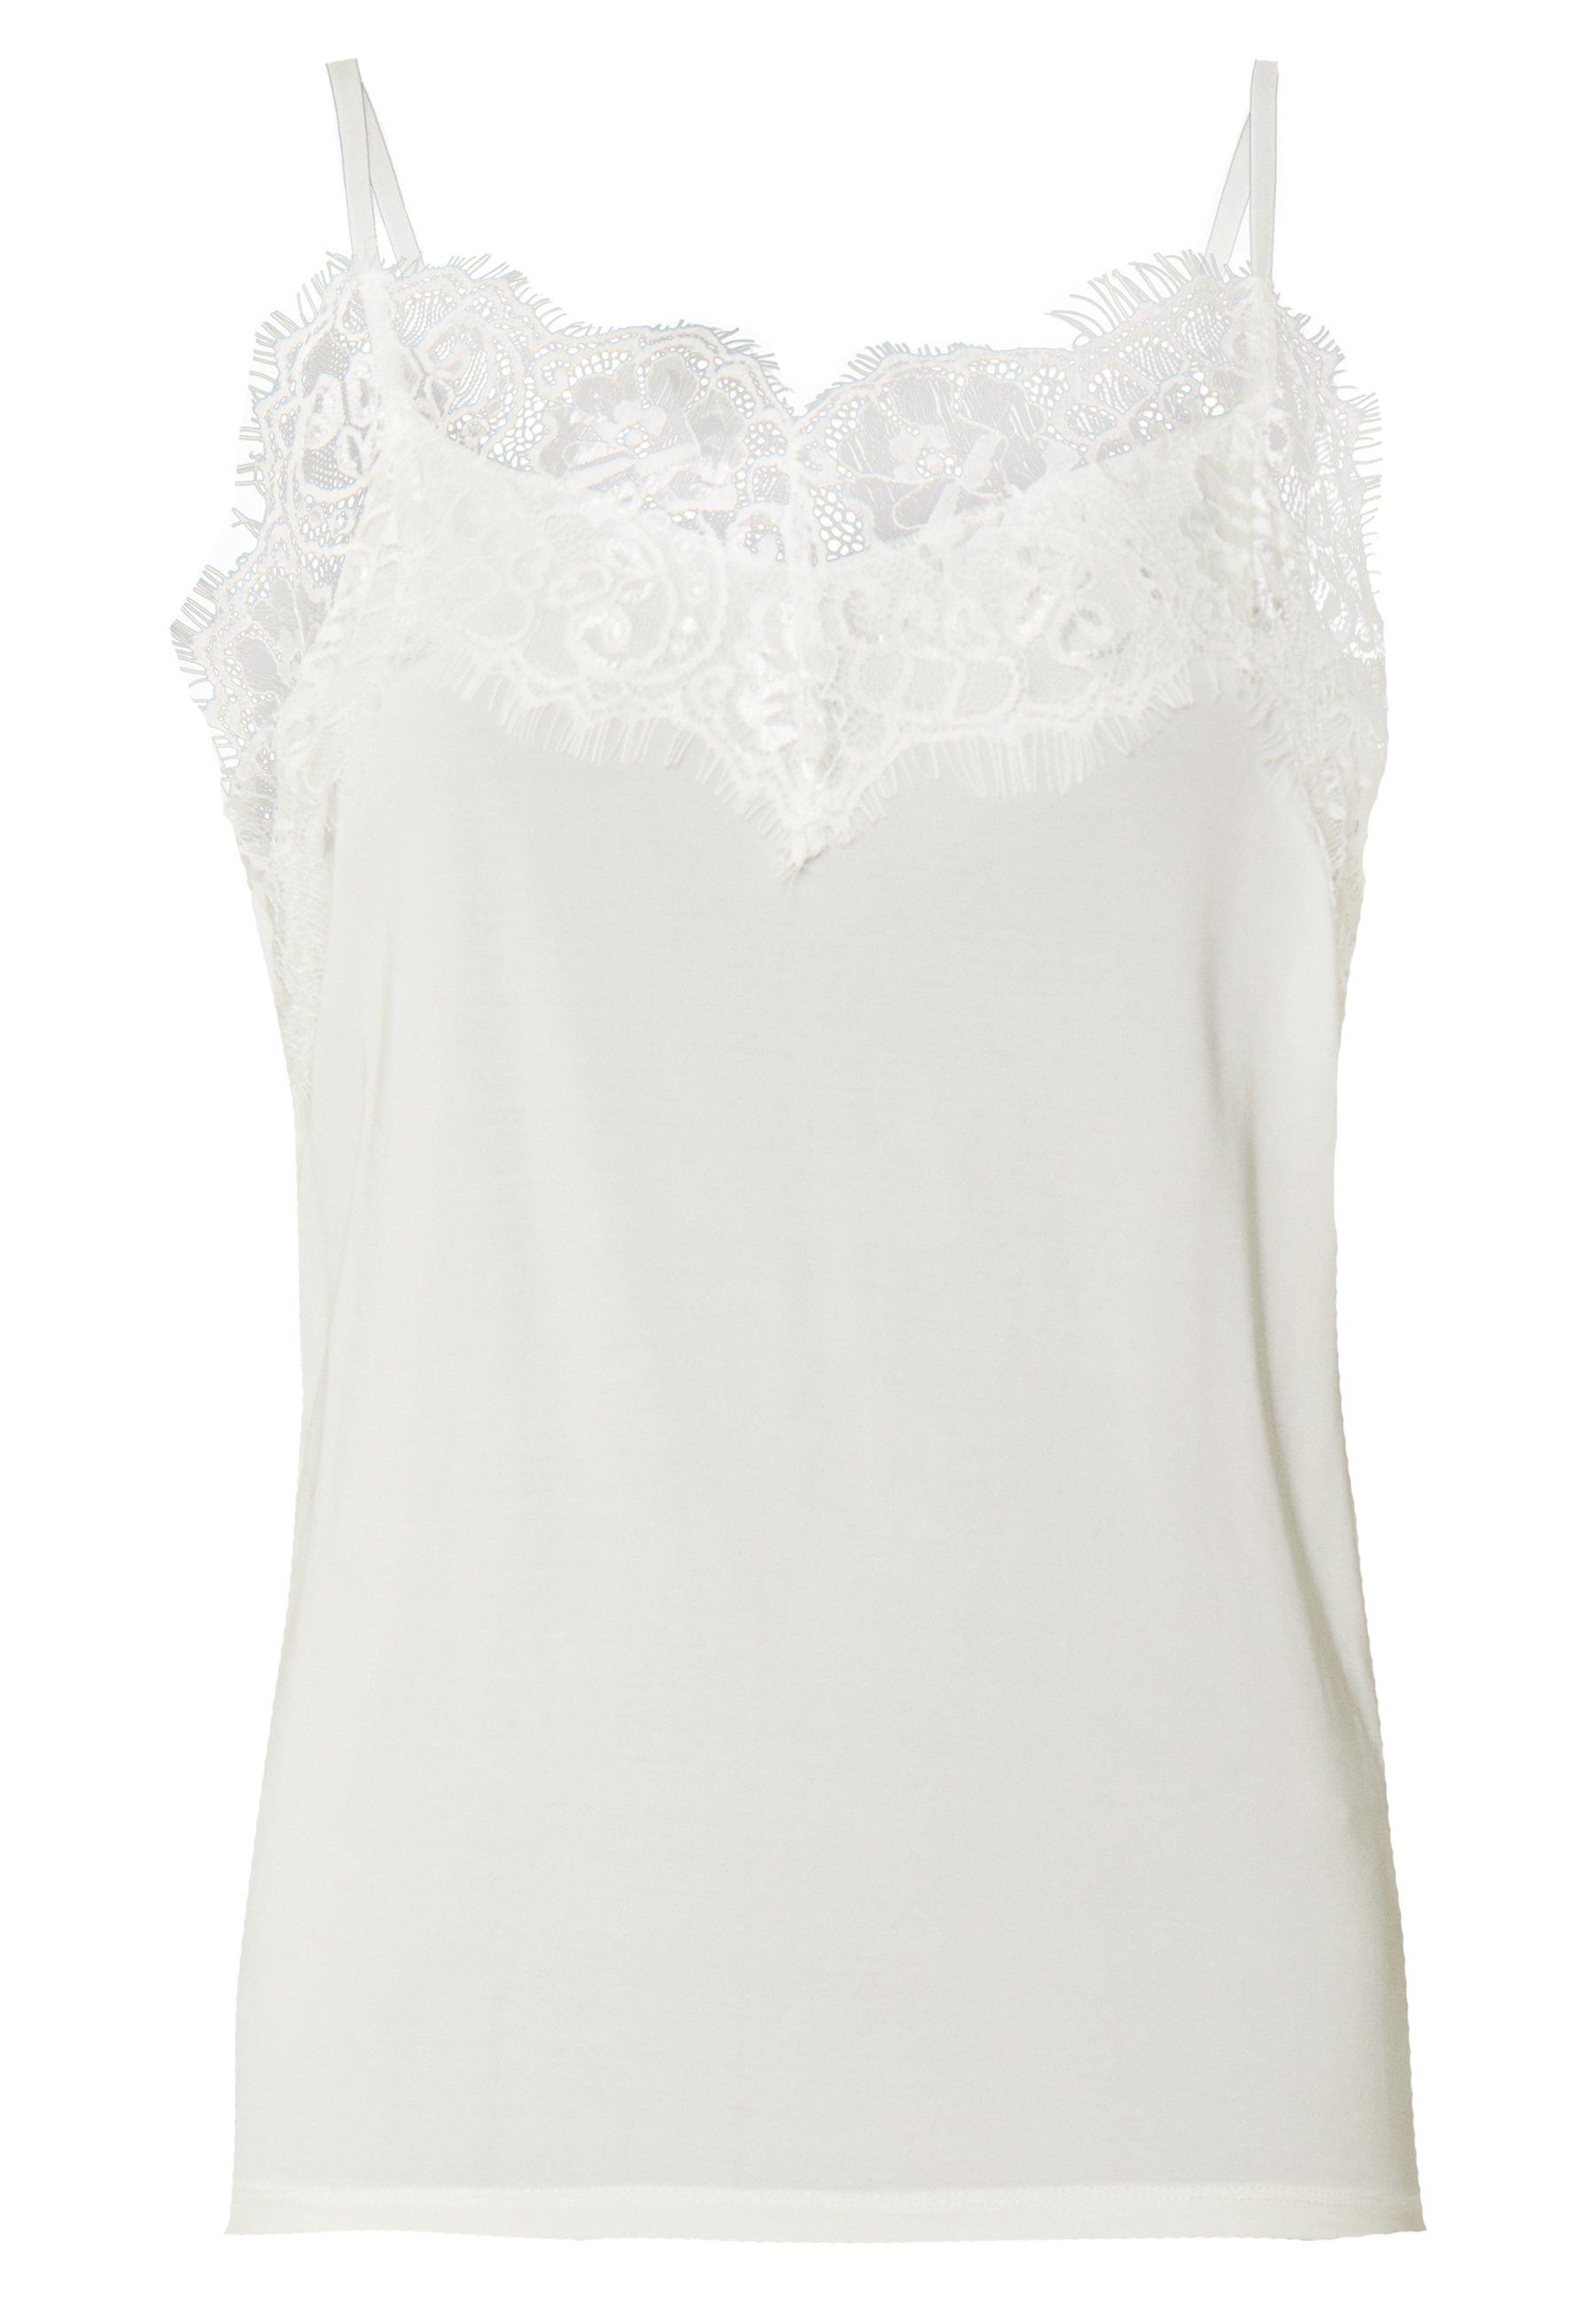 Soaked In Luxury Clara Singlet - Topper White/offwhite